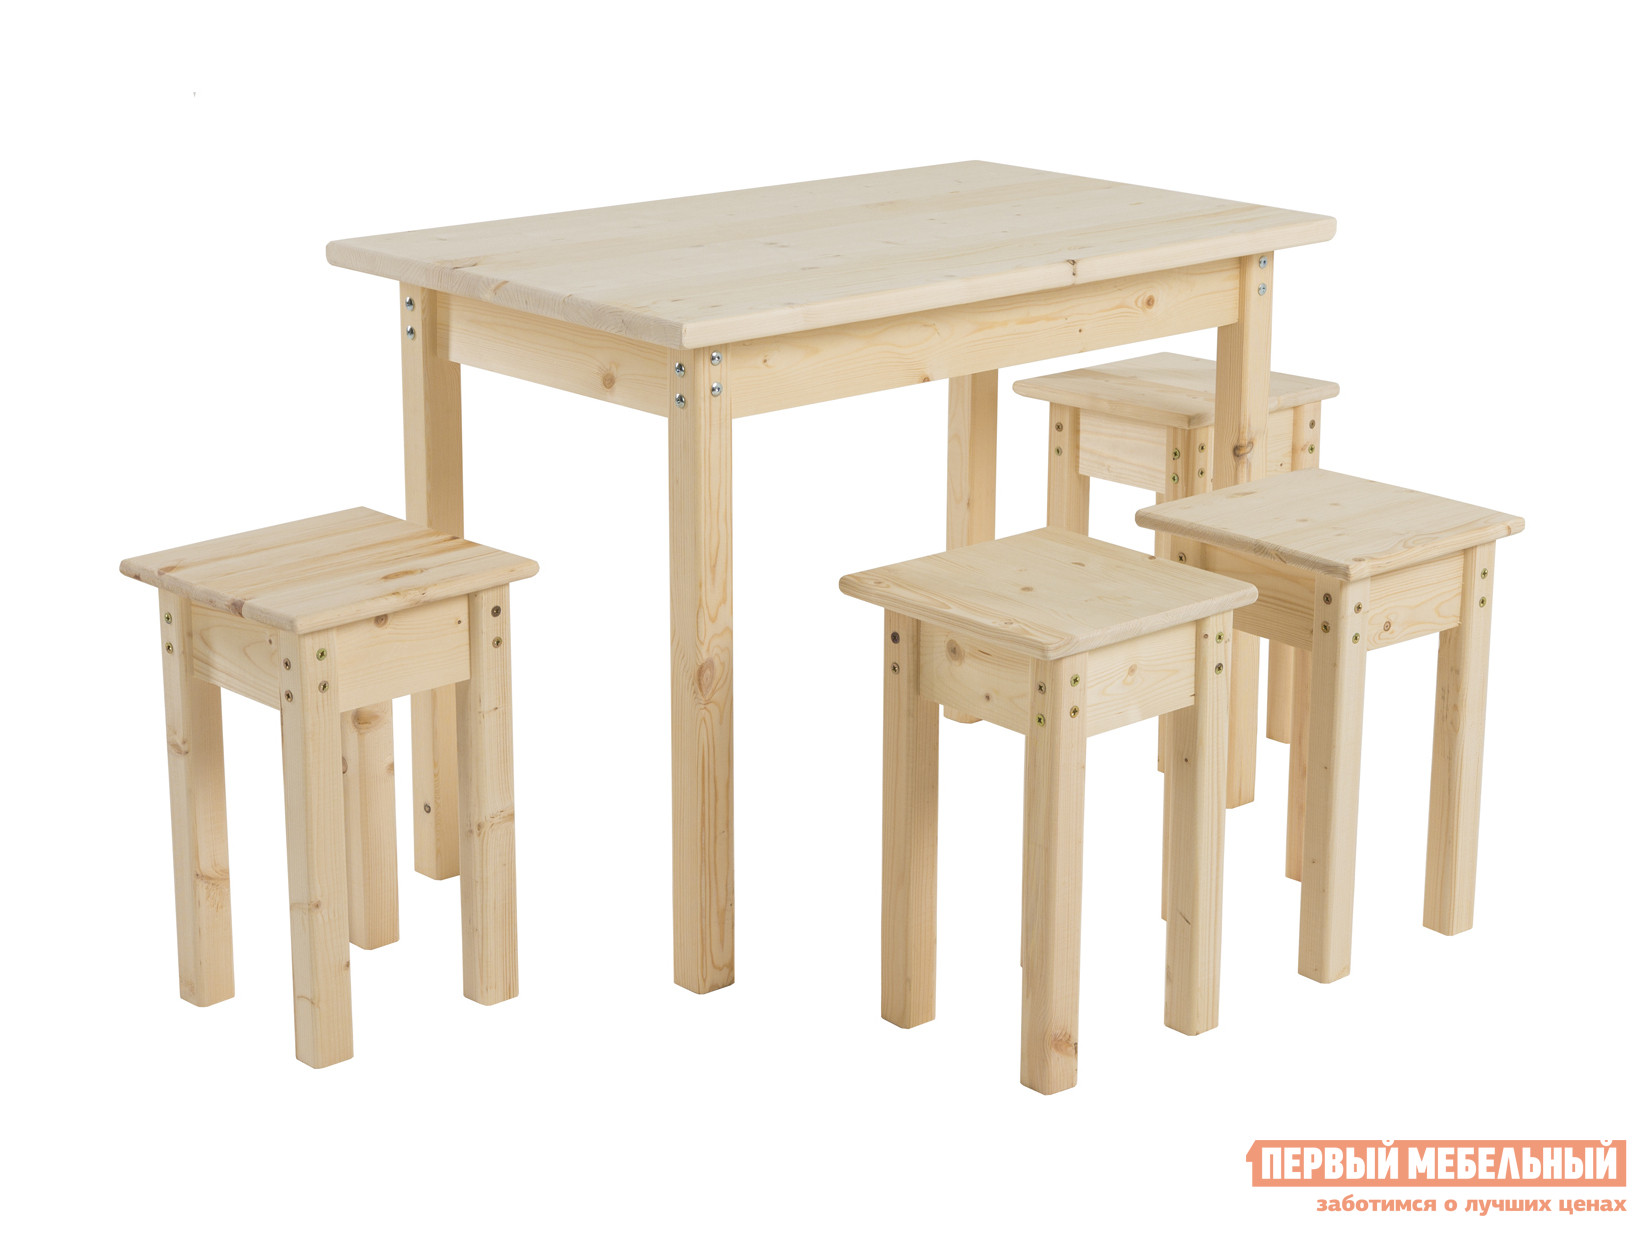 Комплект садовой мебели Green Mebel Стол со столешницей 600х1000х28 + Табурет 300х300х450 (4 шт) Натуральный